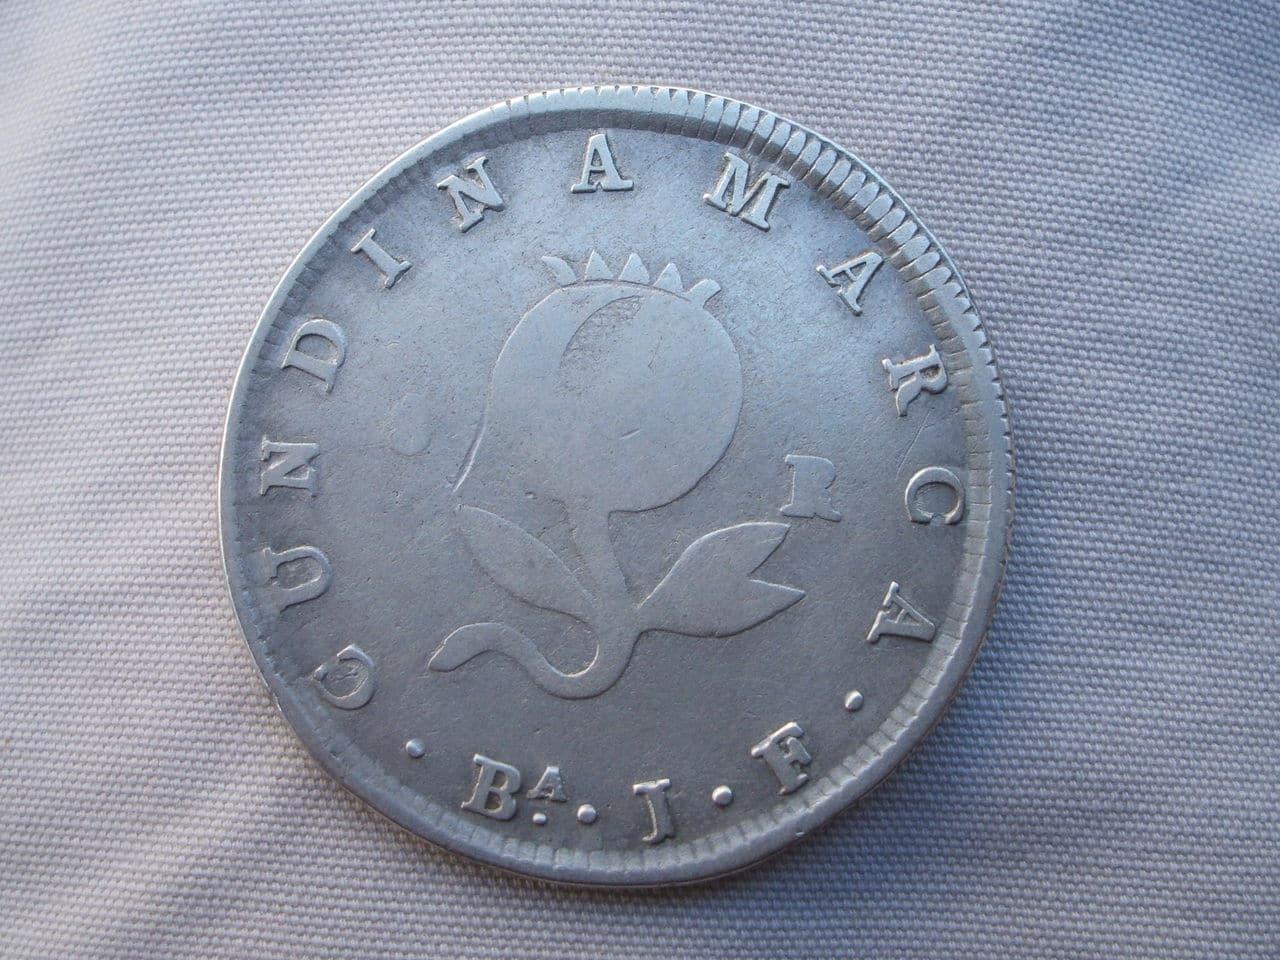 cundinamarca - 8 Reales. Colombia. 1821. Cundinamarca Si_3